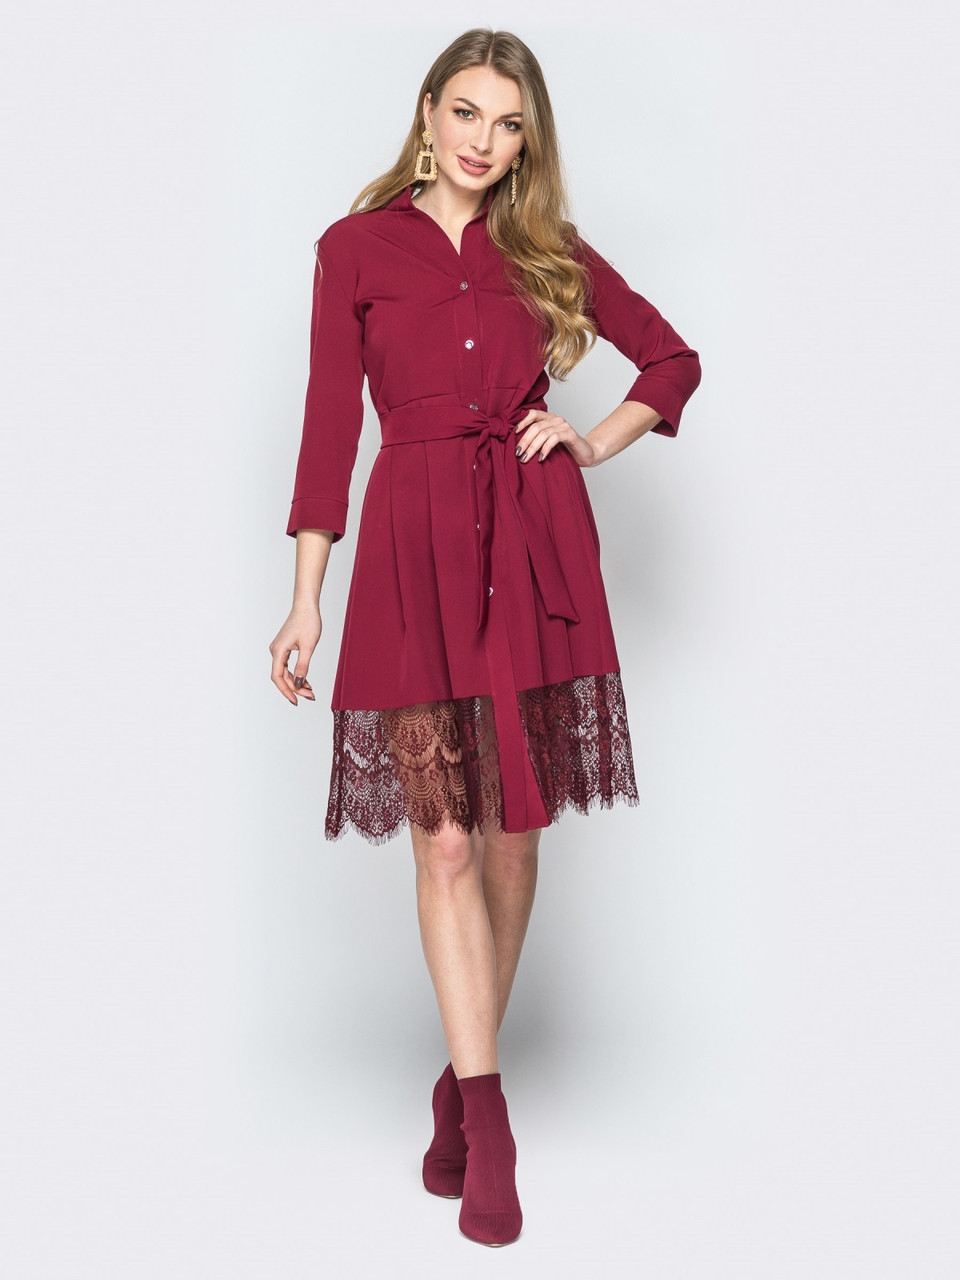 728072103e9e228 Красивое нарядное бордовое платье-рубашка с кружевом р.42,44,46,48 ...